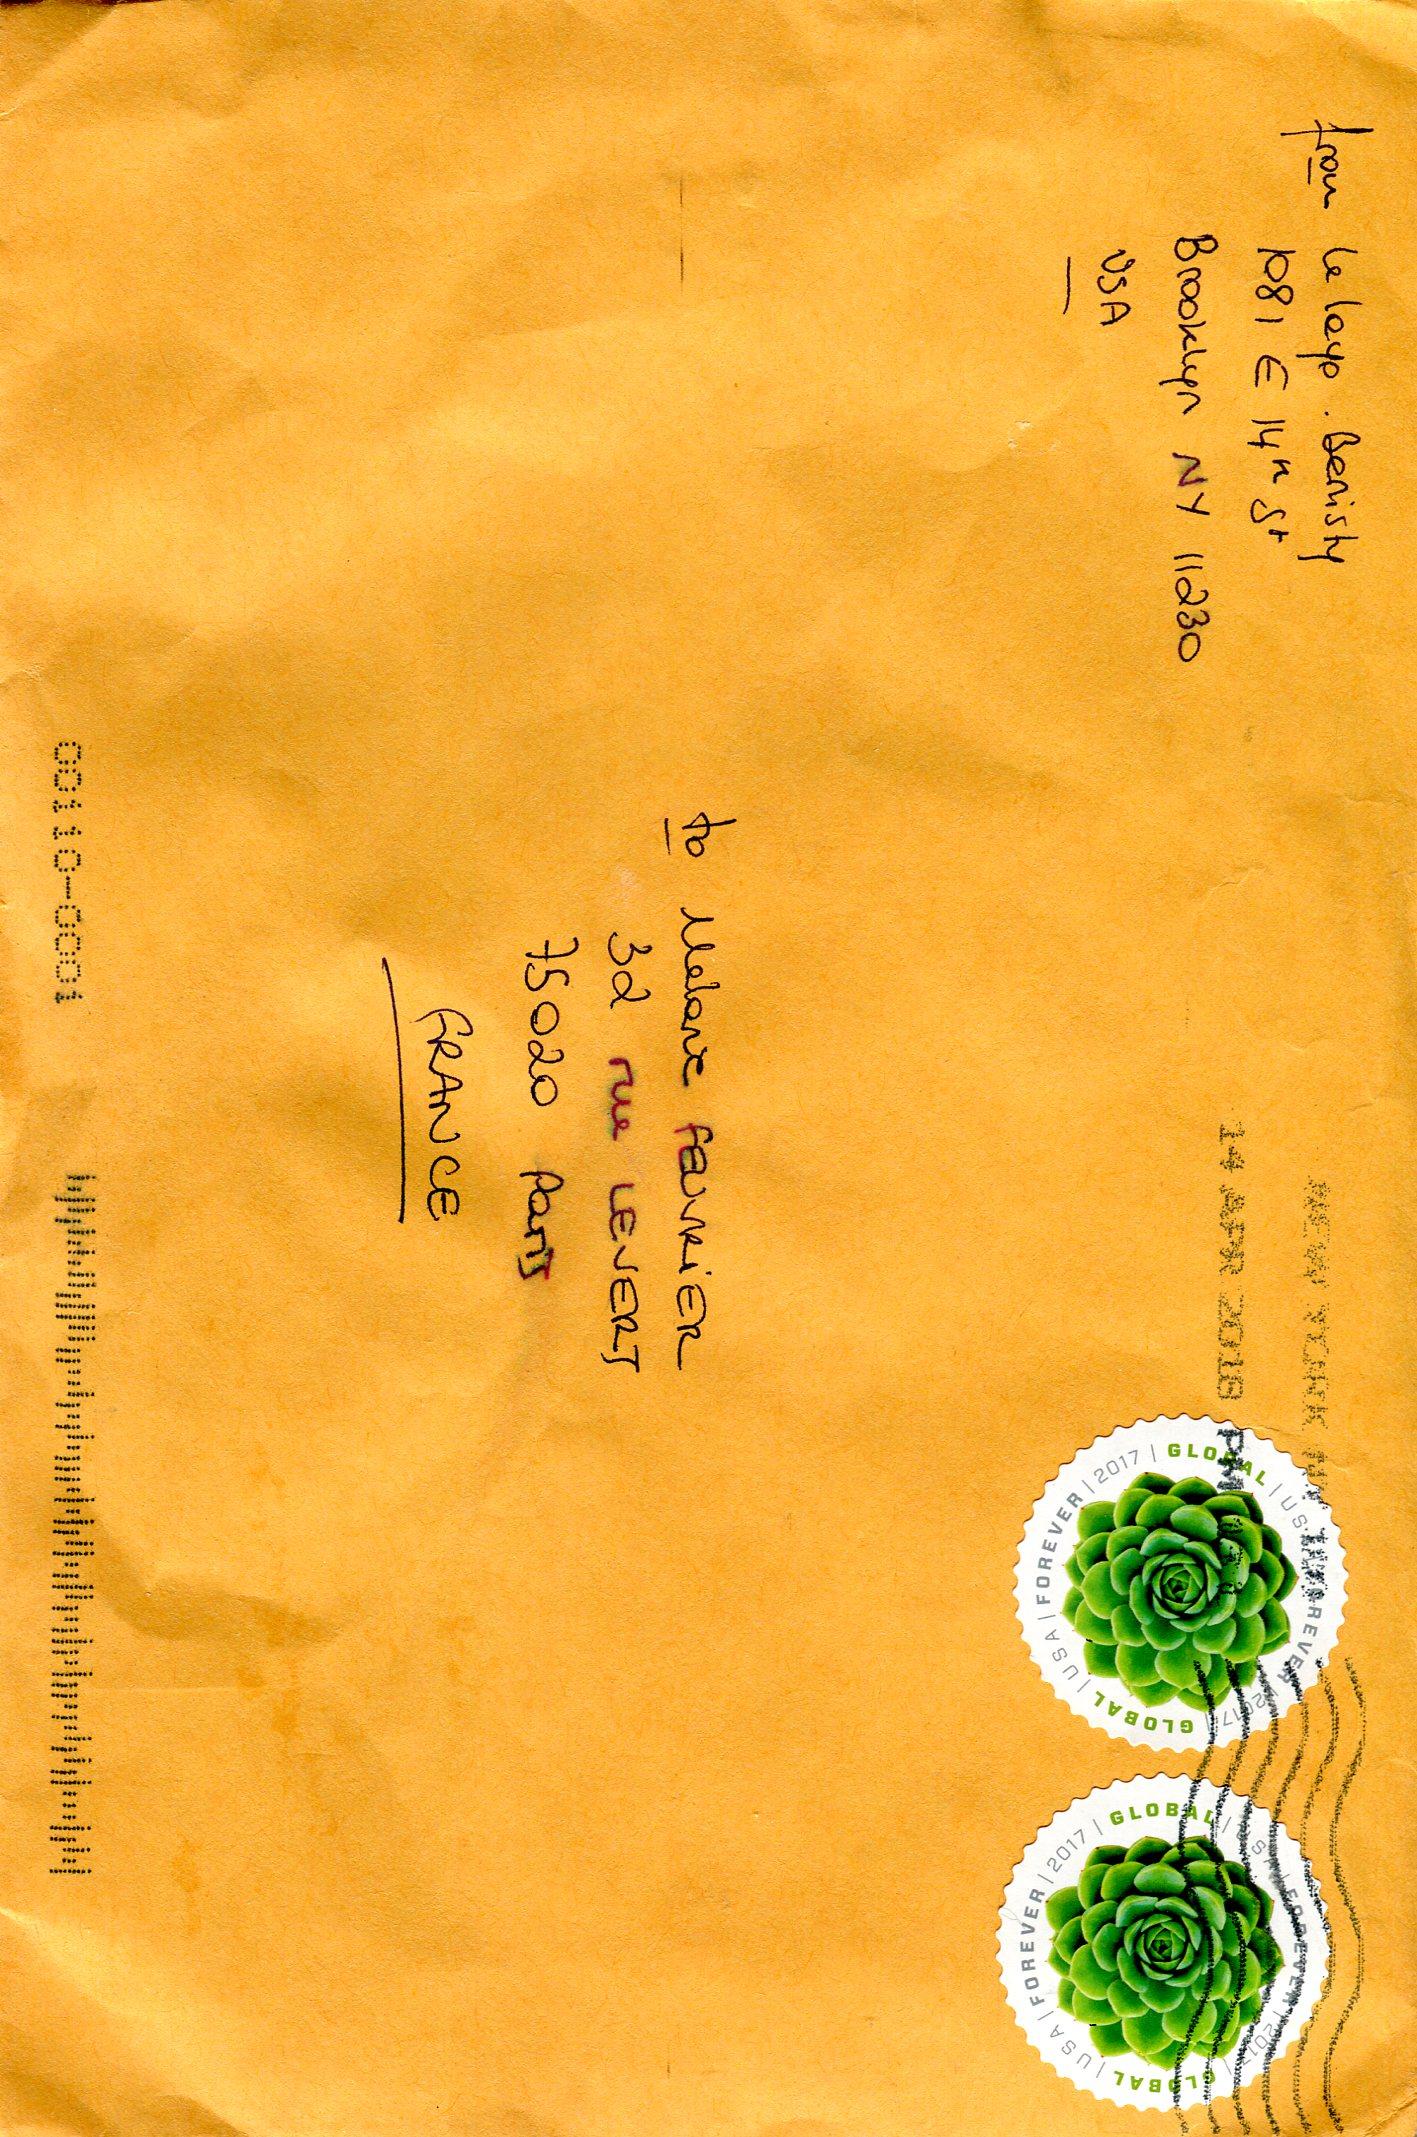 enveloppe005